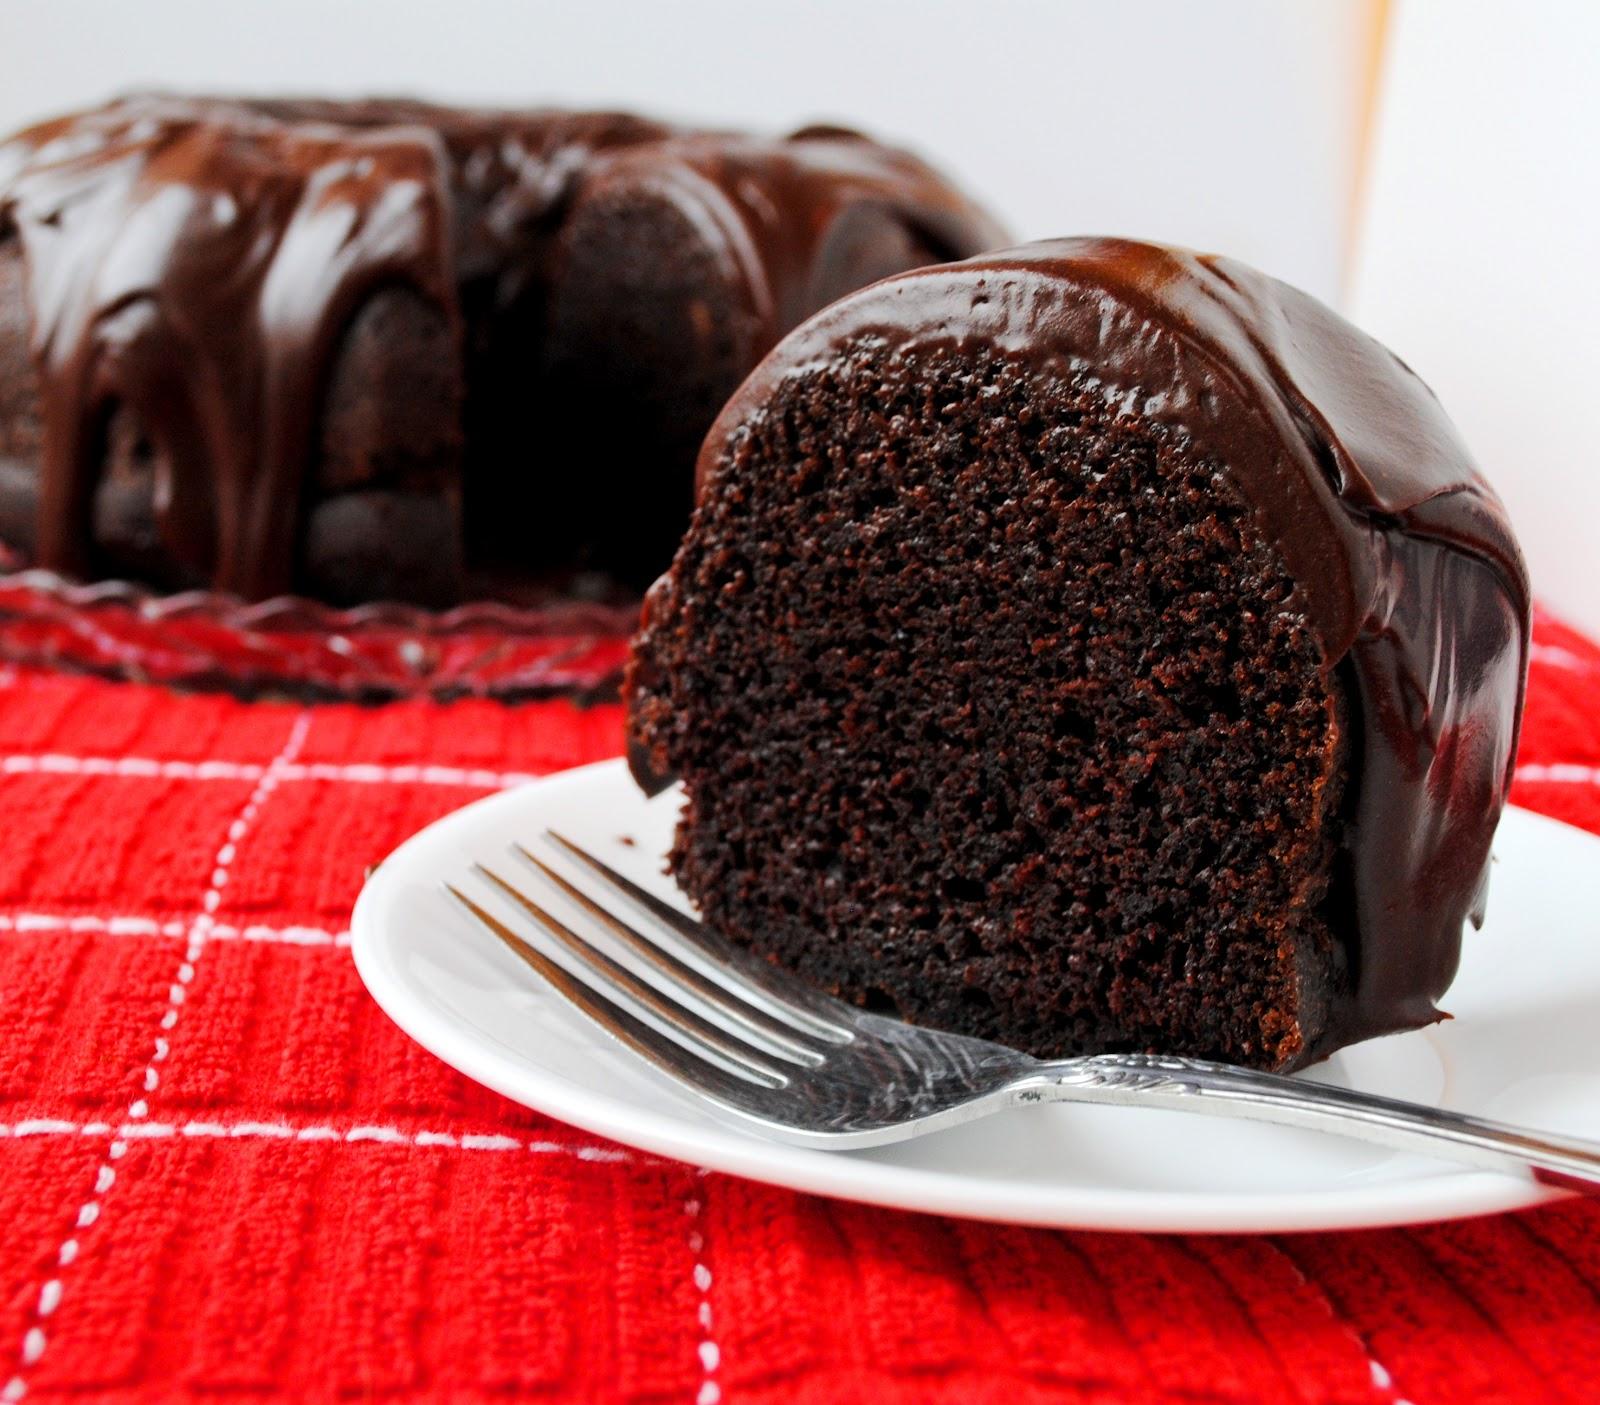 Best Chocolate Frosting For Bundt Cake